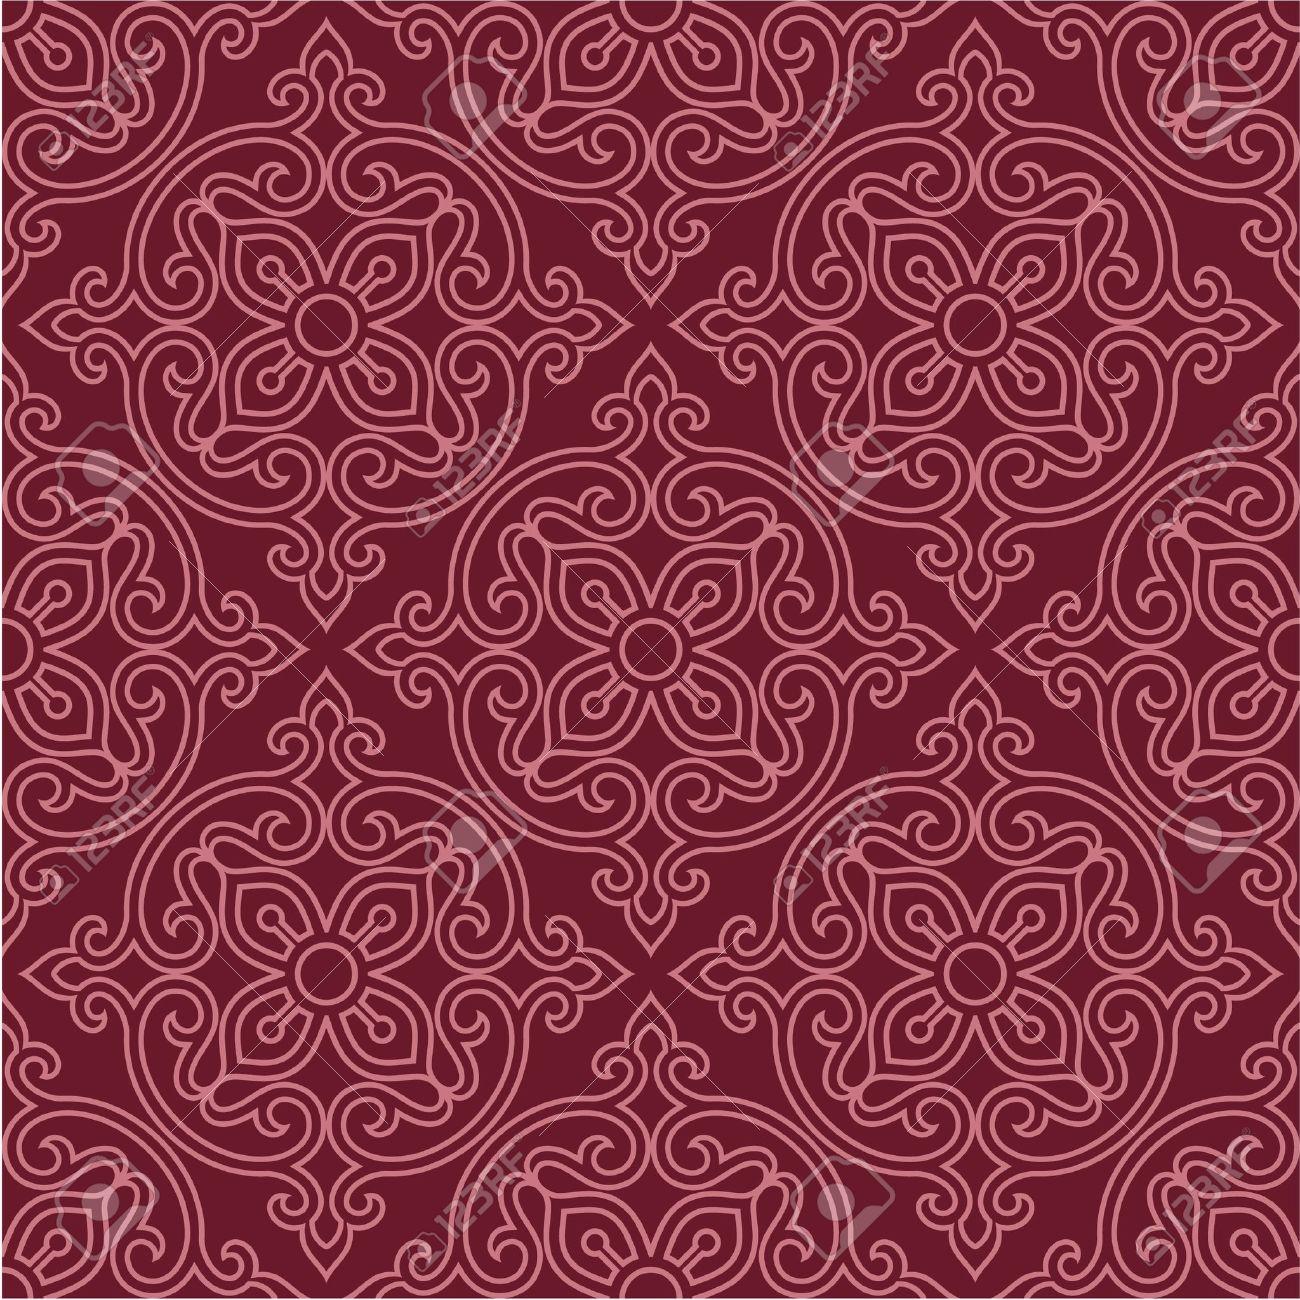 Oriental Seamless Pattern - Background, Wallpaper, Tile - 12826142